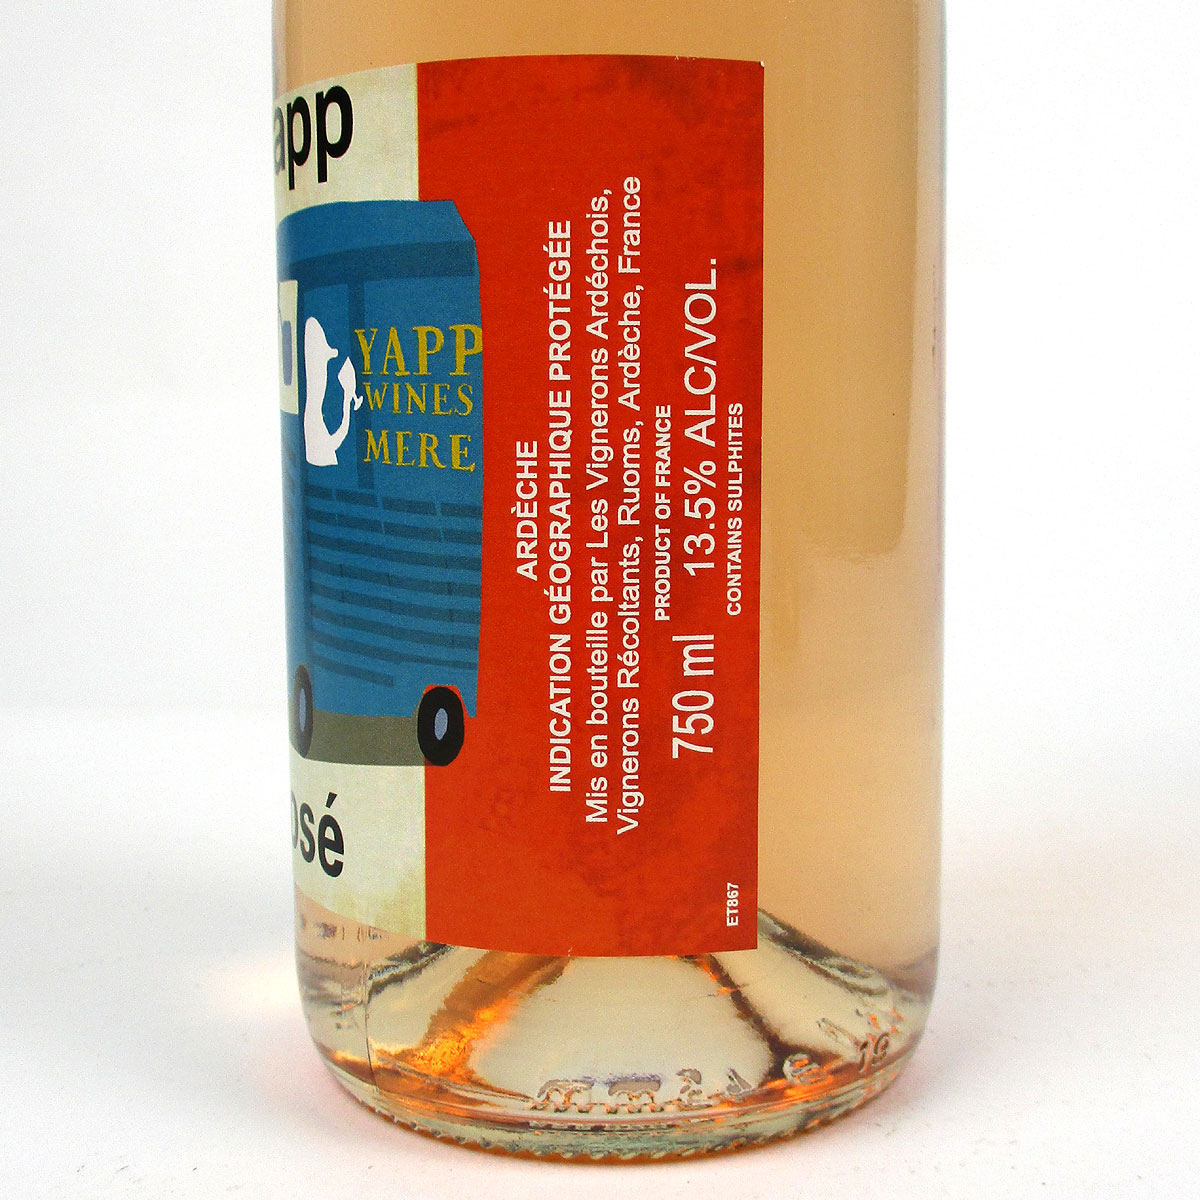 Yapp Rosé 2020 - Bottle Label Side